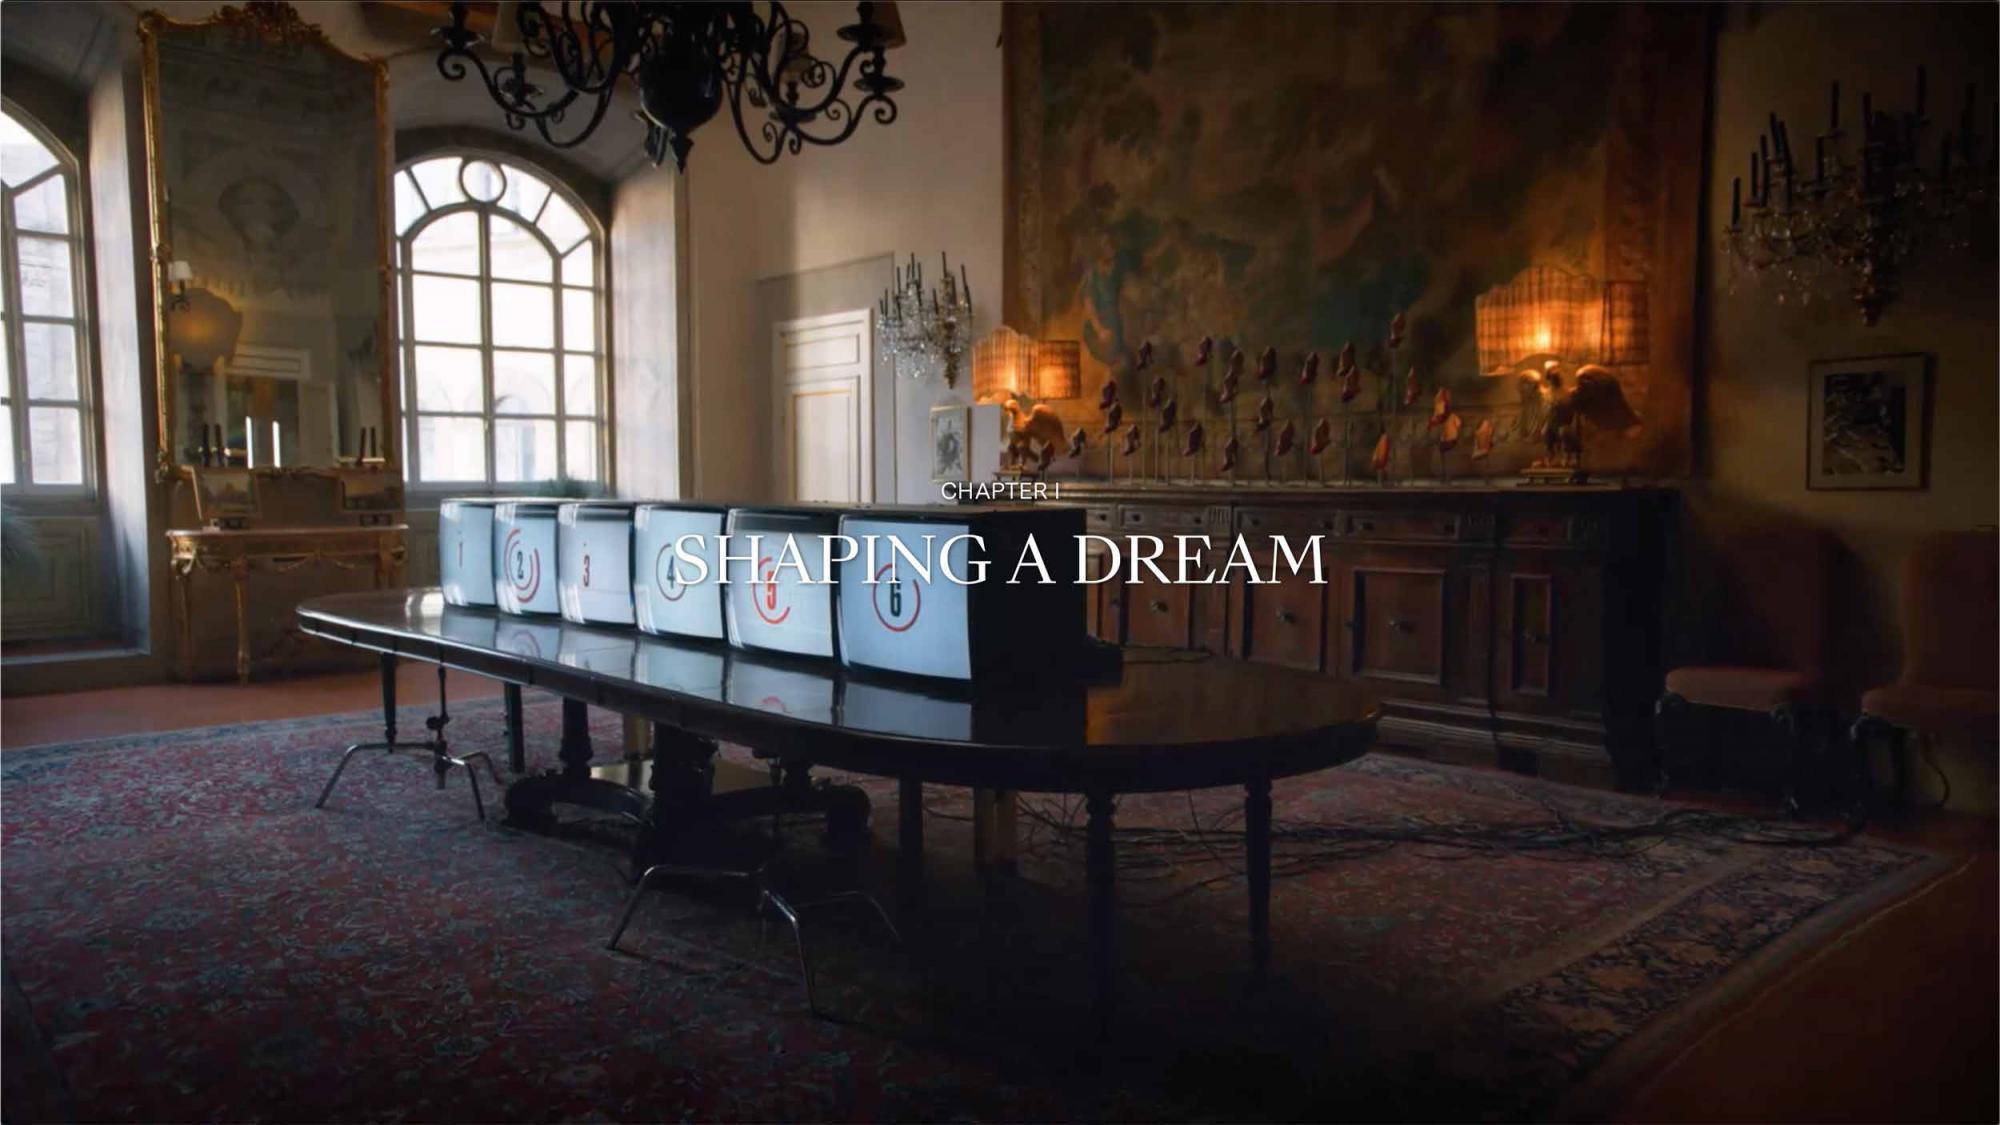 Salvatore-Ferragamo-Shaping-A-Dream-1.jpg